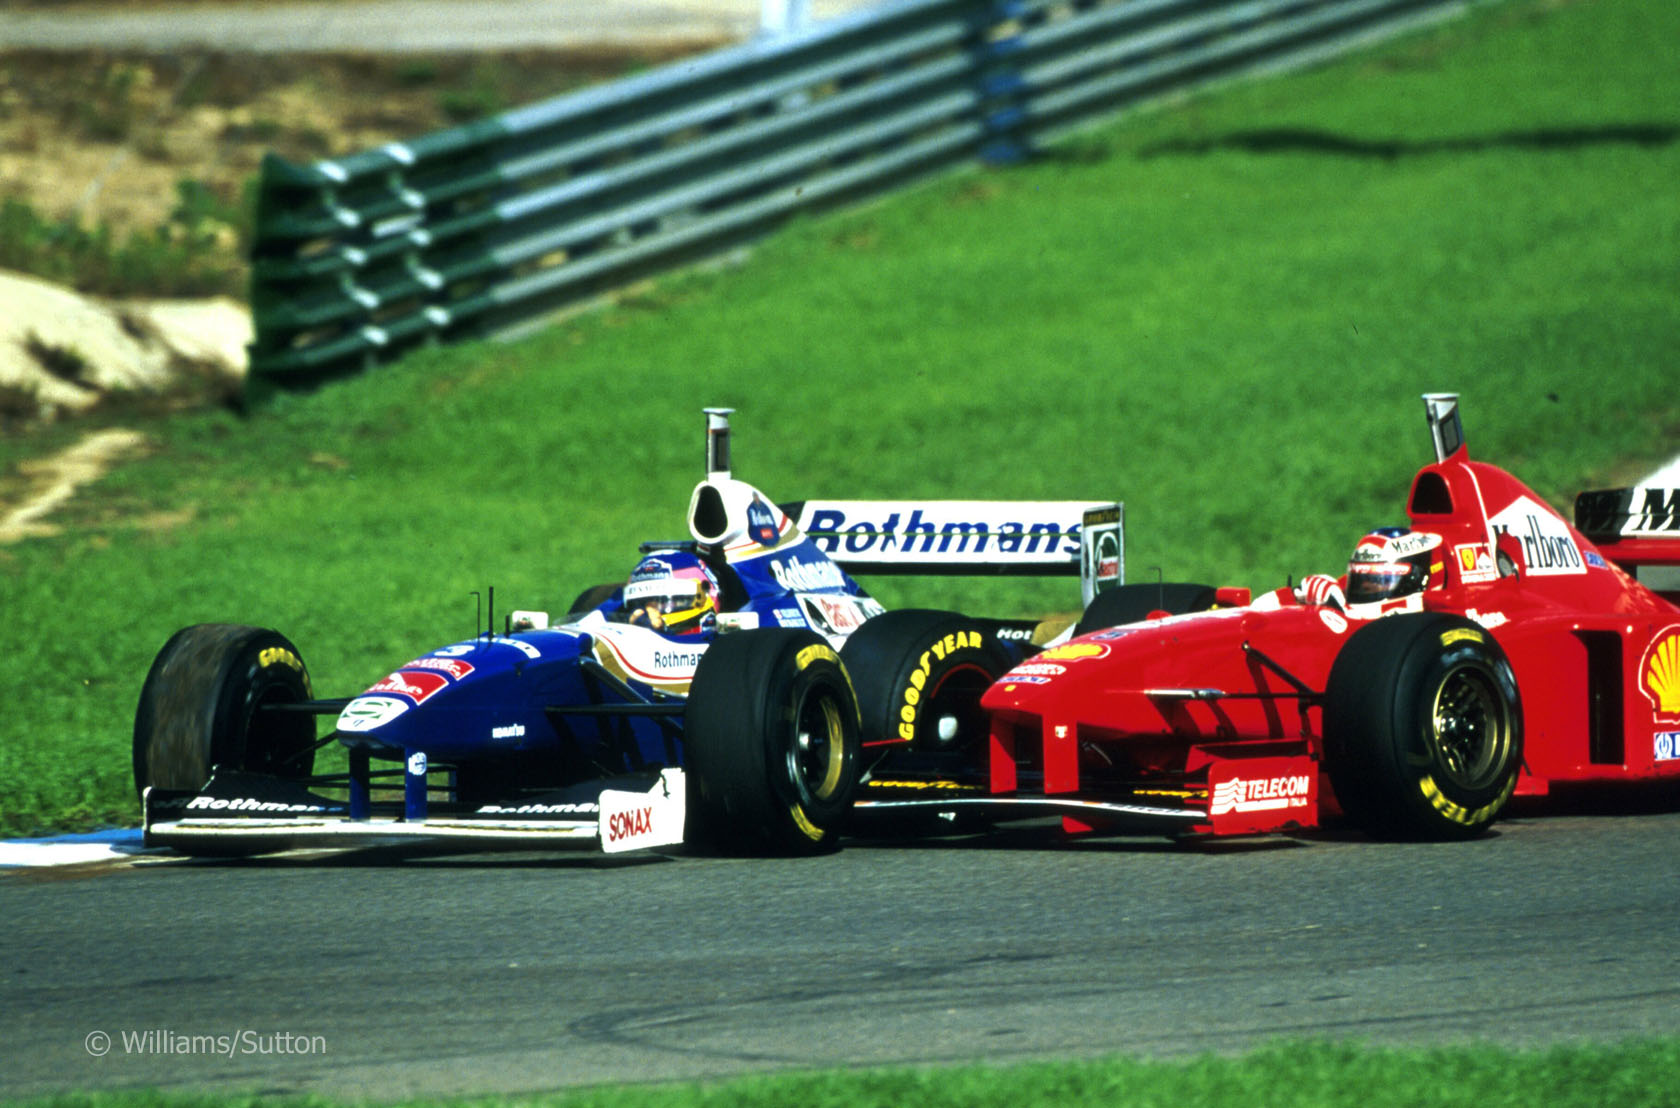 1997 European GP flashback Villeneuve beats Schumacher